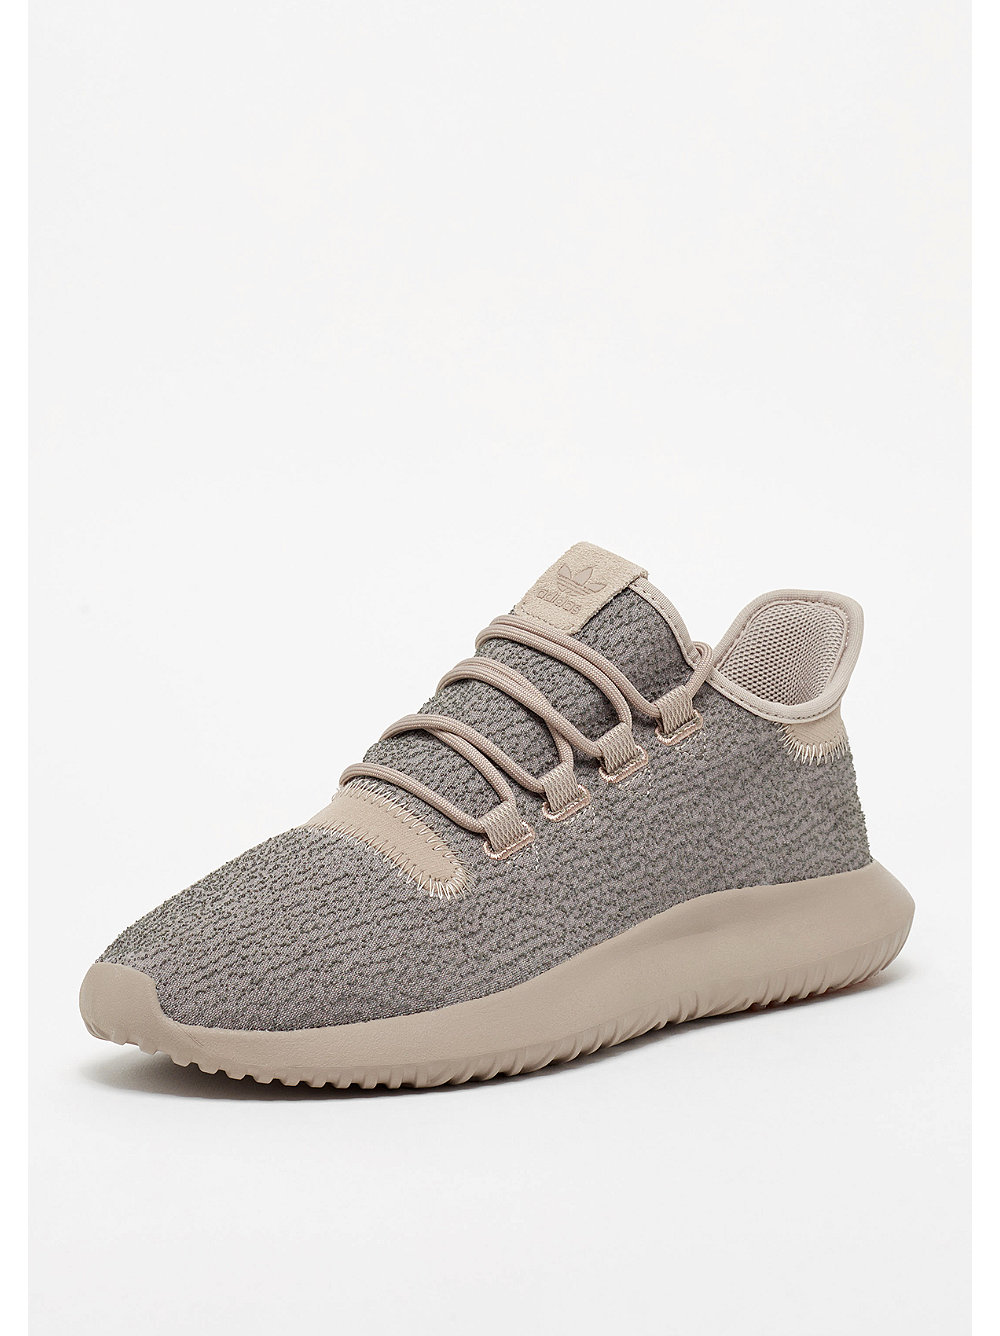 adidas Tubular Shadow vapour grey im SNIPES Onlineshop - sommerprogramme.de f6d2bb6cd0